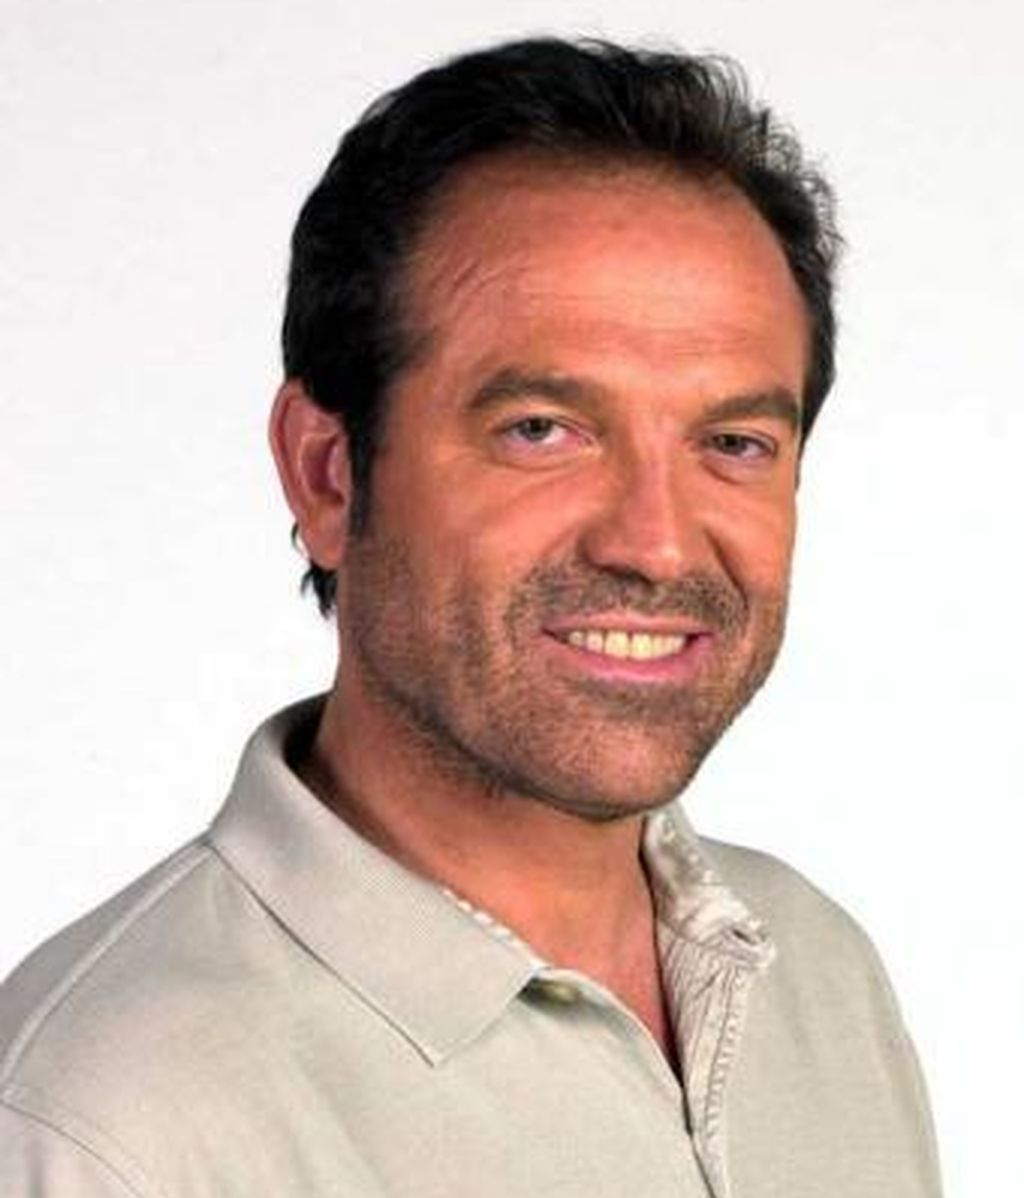 Pepe Navarro, primer invitado de Tonterías las justas